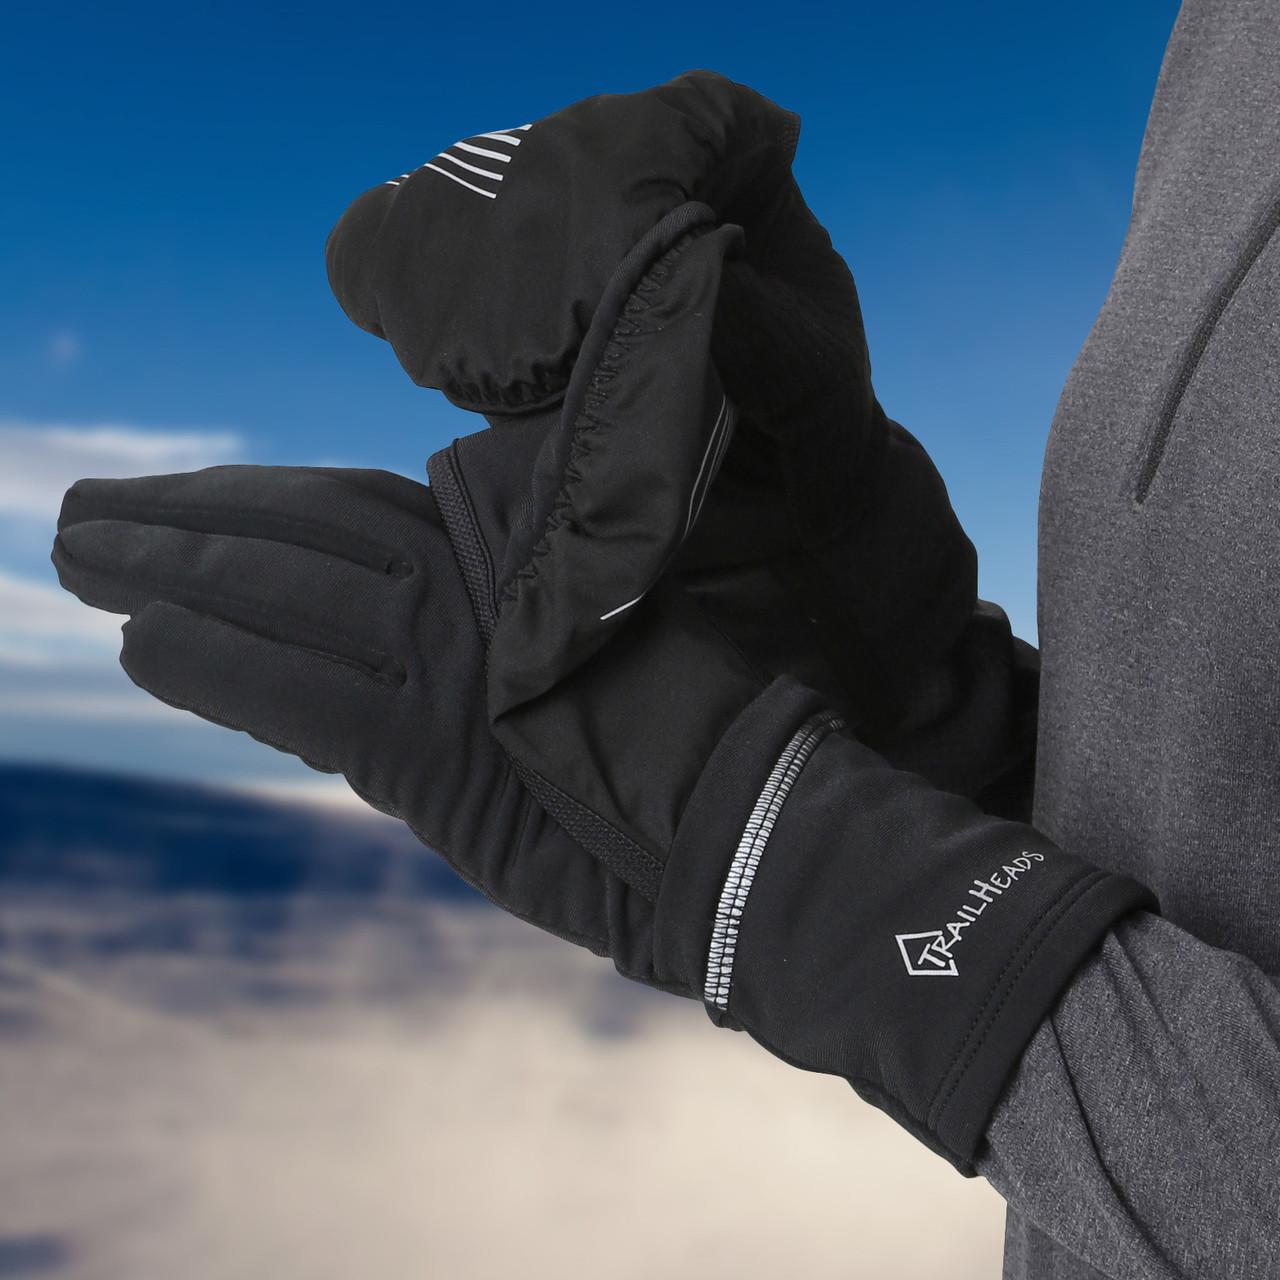 tuck away mitten cover when not needed